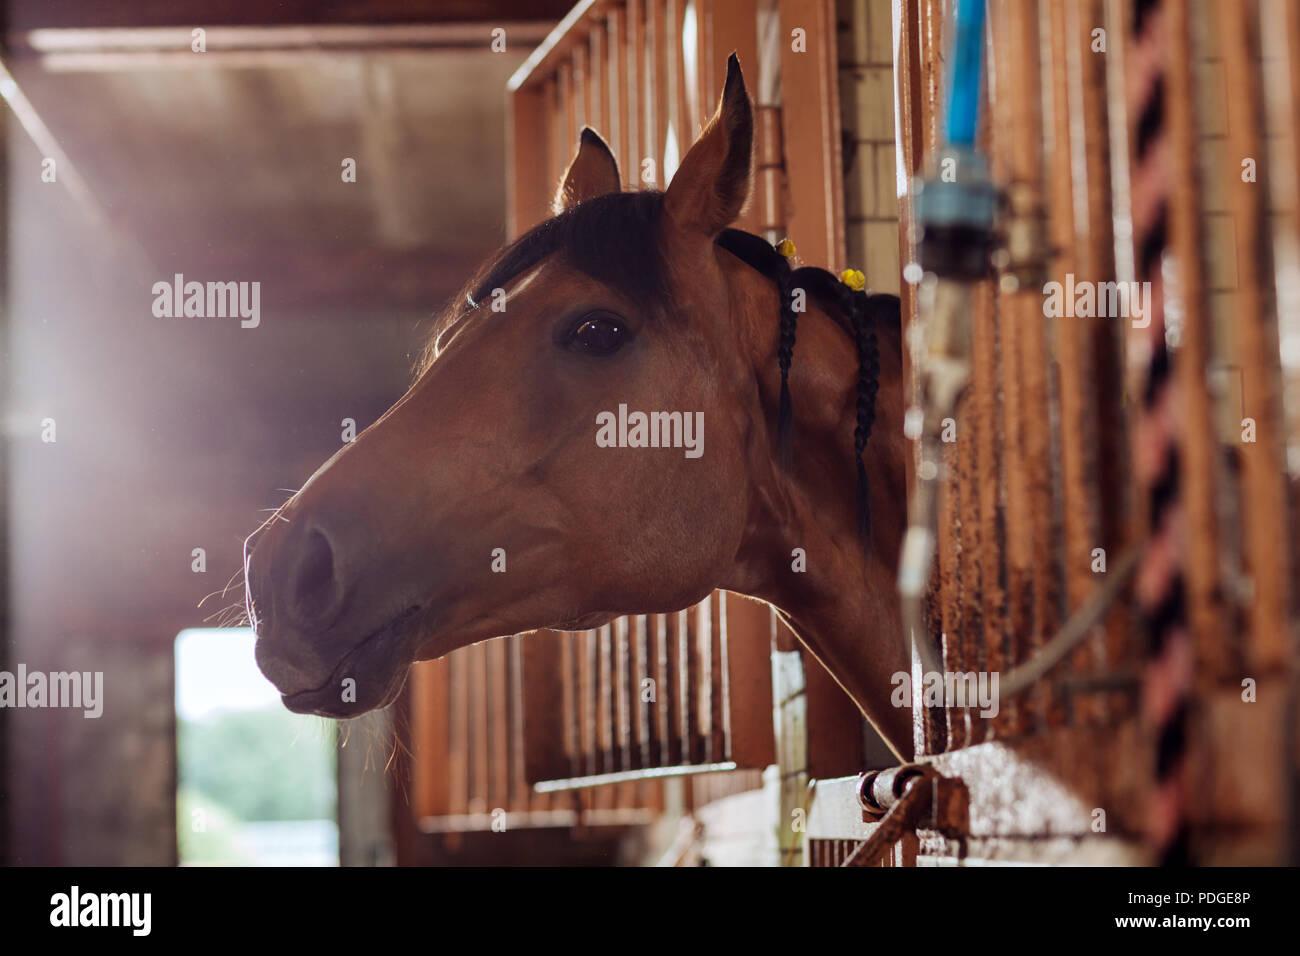 Beautiful brown racing horse standing in big spacious stable - Stock Image